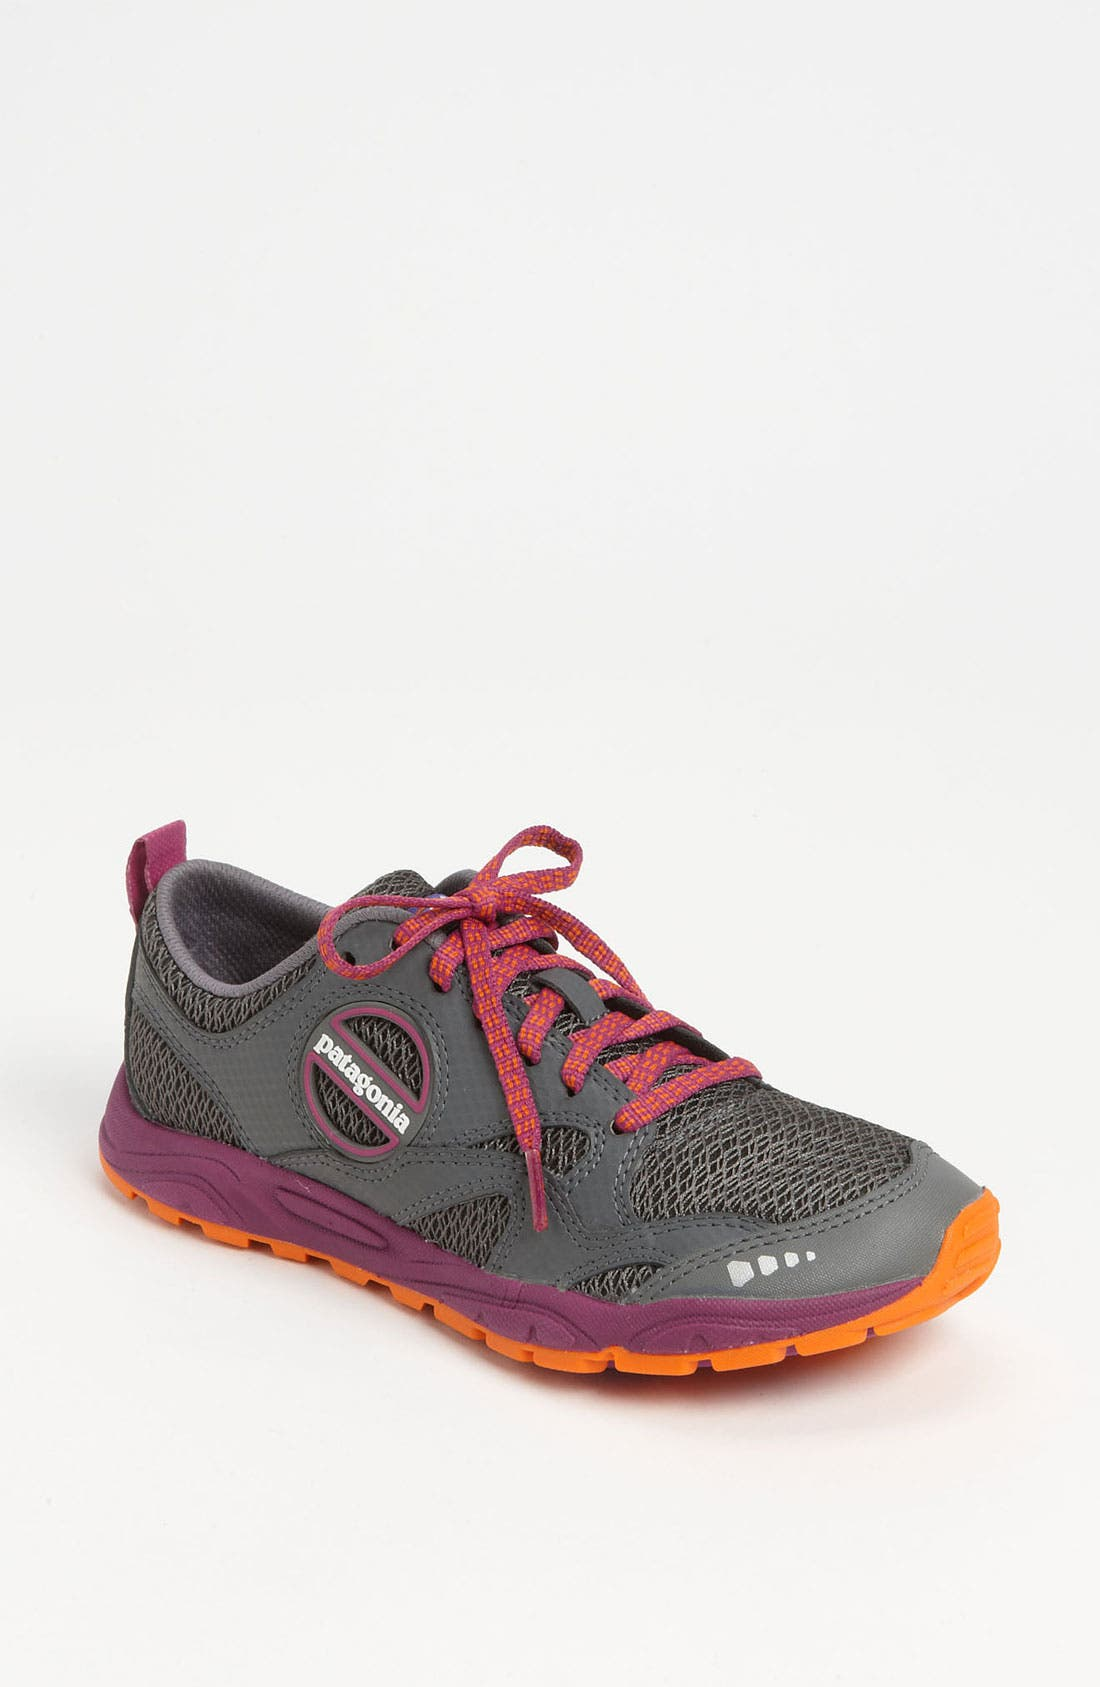 Alternate Image 1 Selected - Patagonia 'EVERmore' Running Shoe (Women)